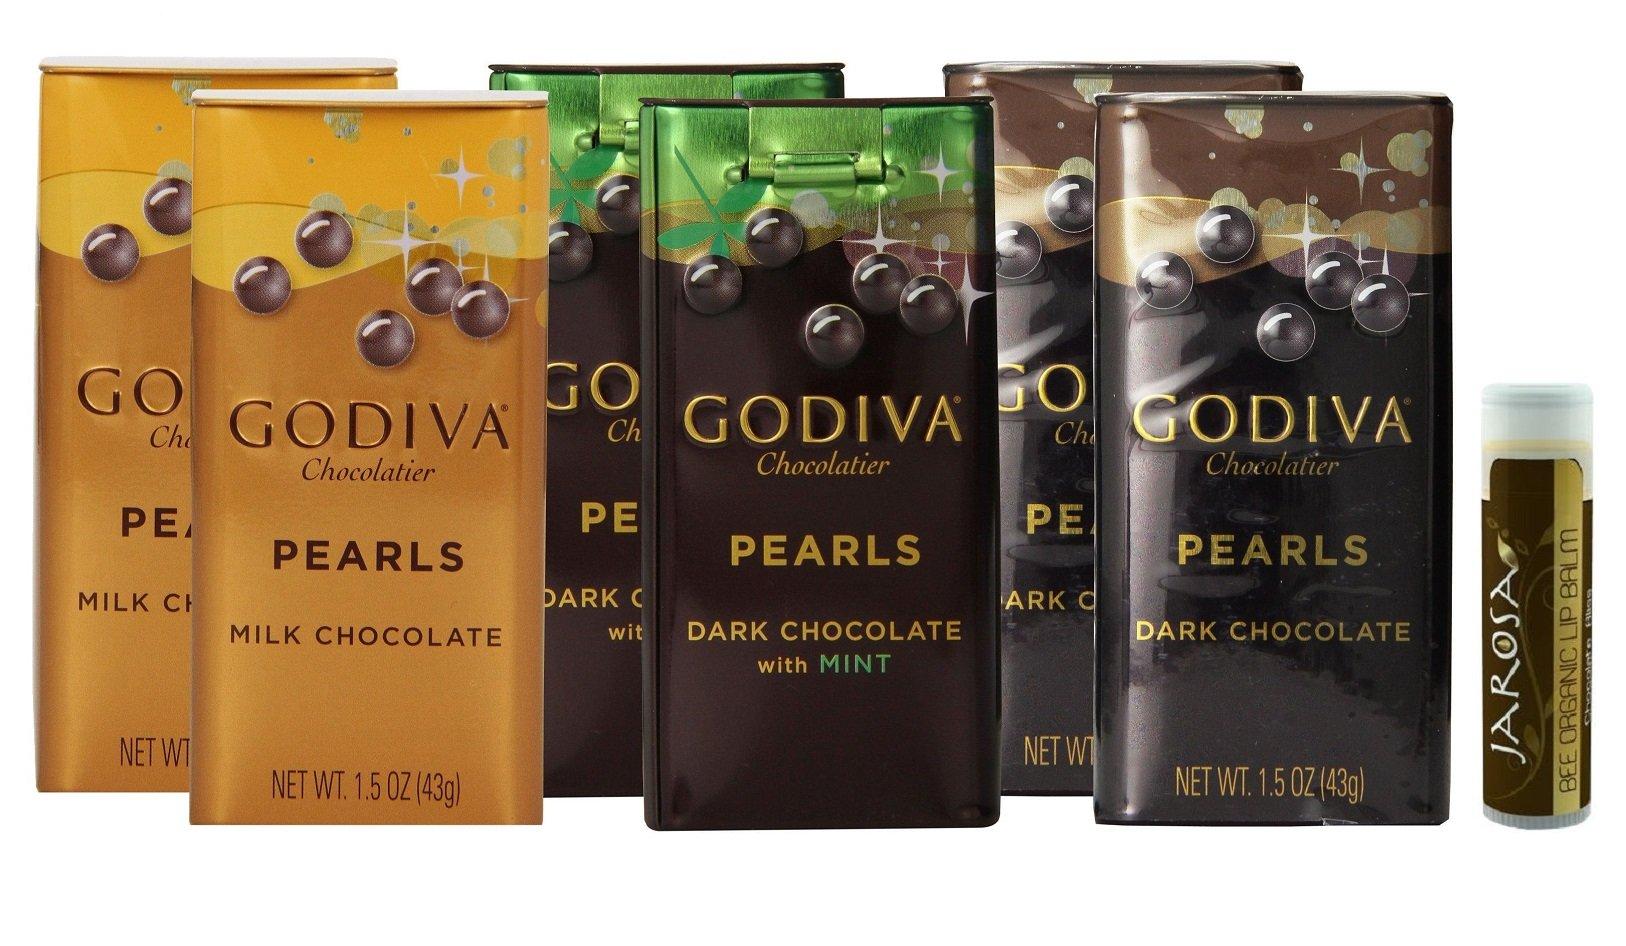 Godiva Pearls Gift Box Set Variety Pack with Dark Chocolate Mint Pearls, Dark Chocolate Pearls & Milk Chocolate Pearls (2 of Each) with a Jarosa Chocolate Bliss Lip Balm by GODIVA Chocolatier